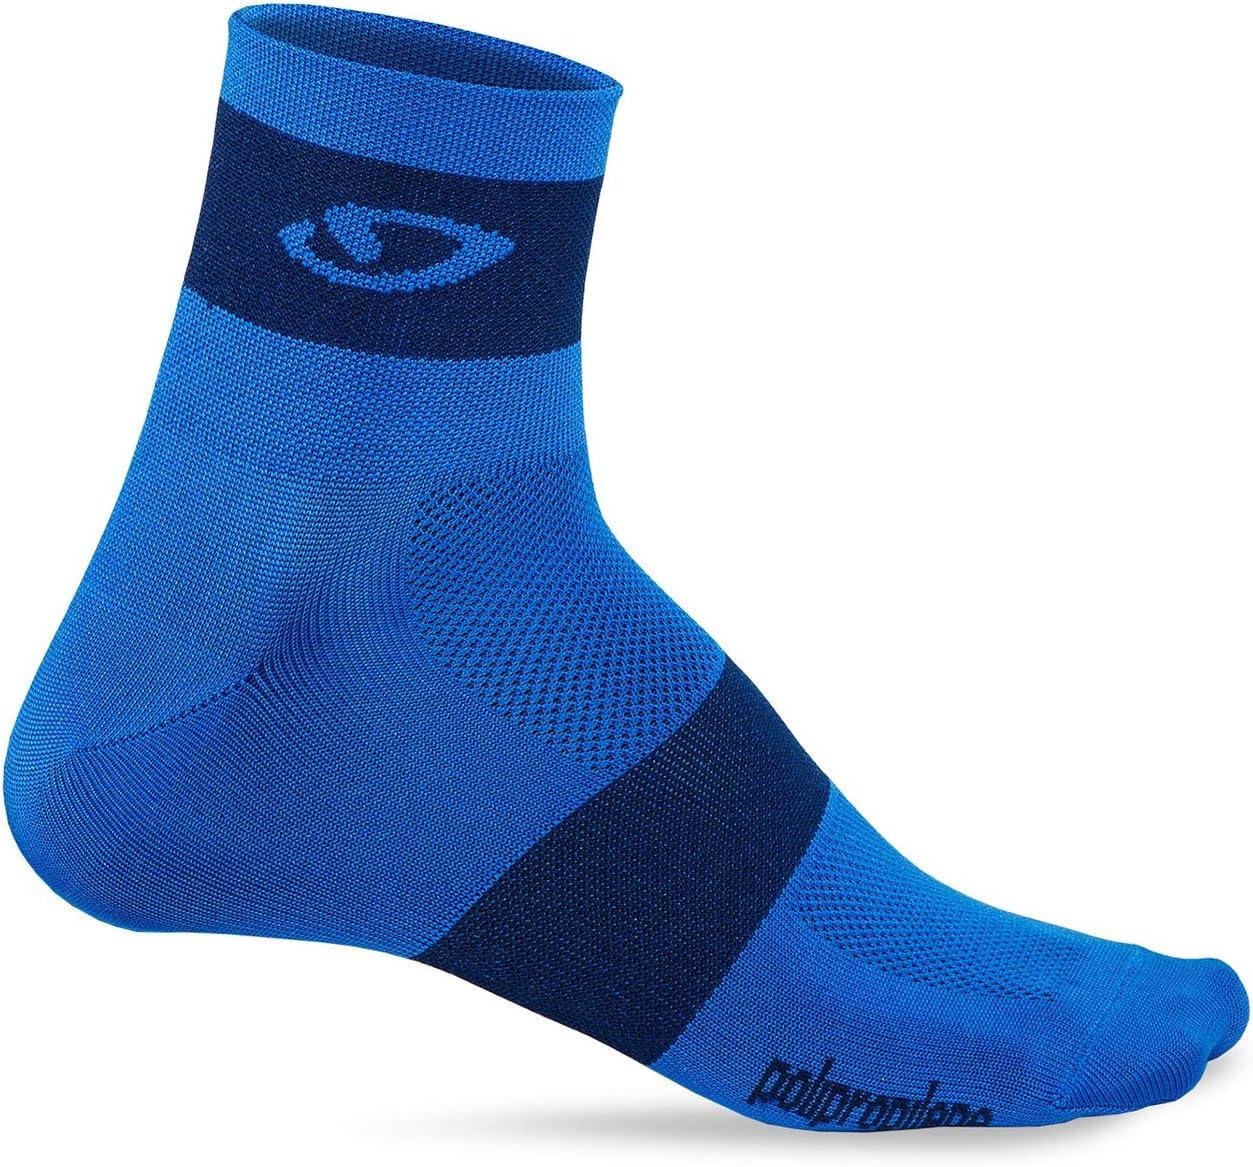 Giro Comp Racer Cycle Socks